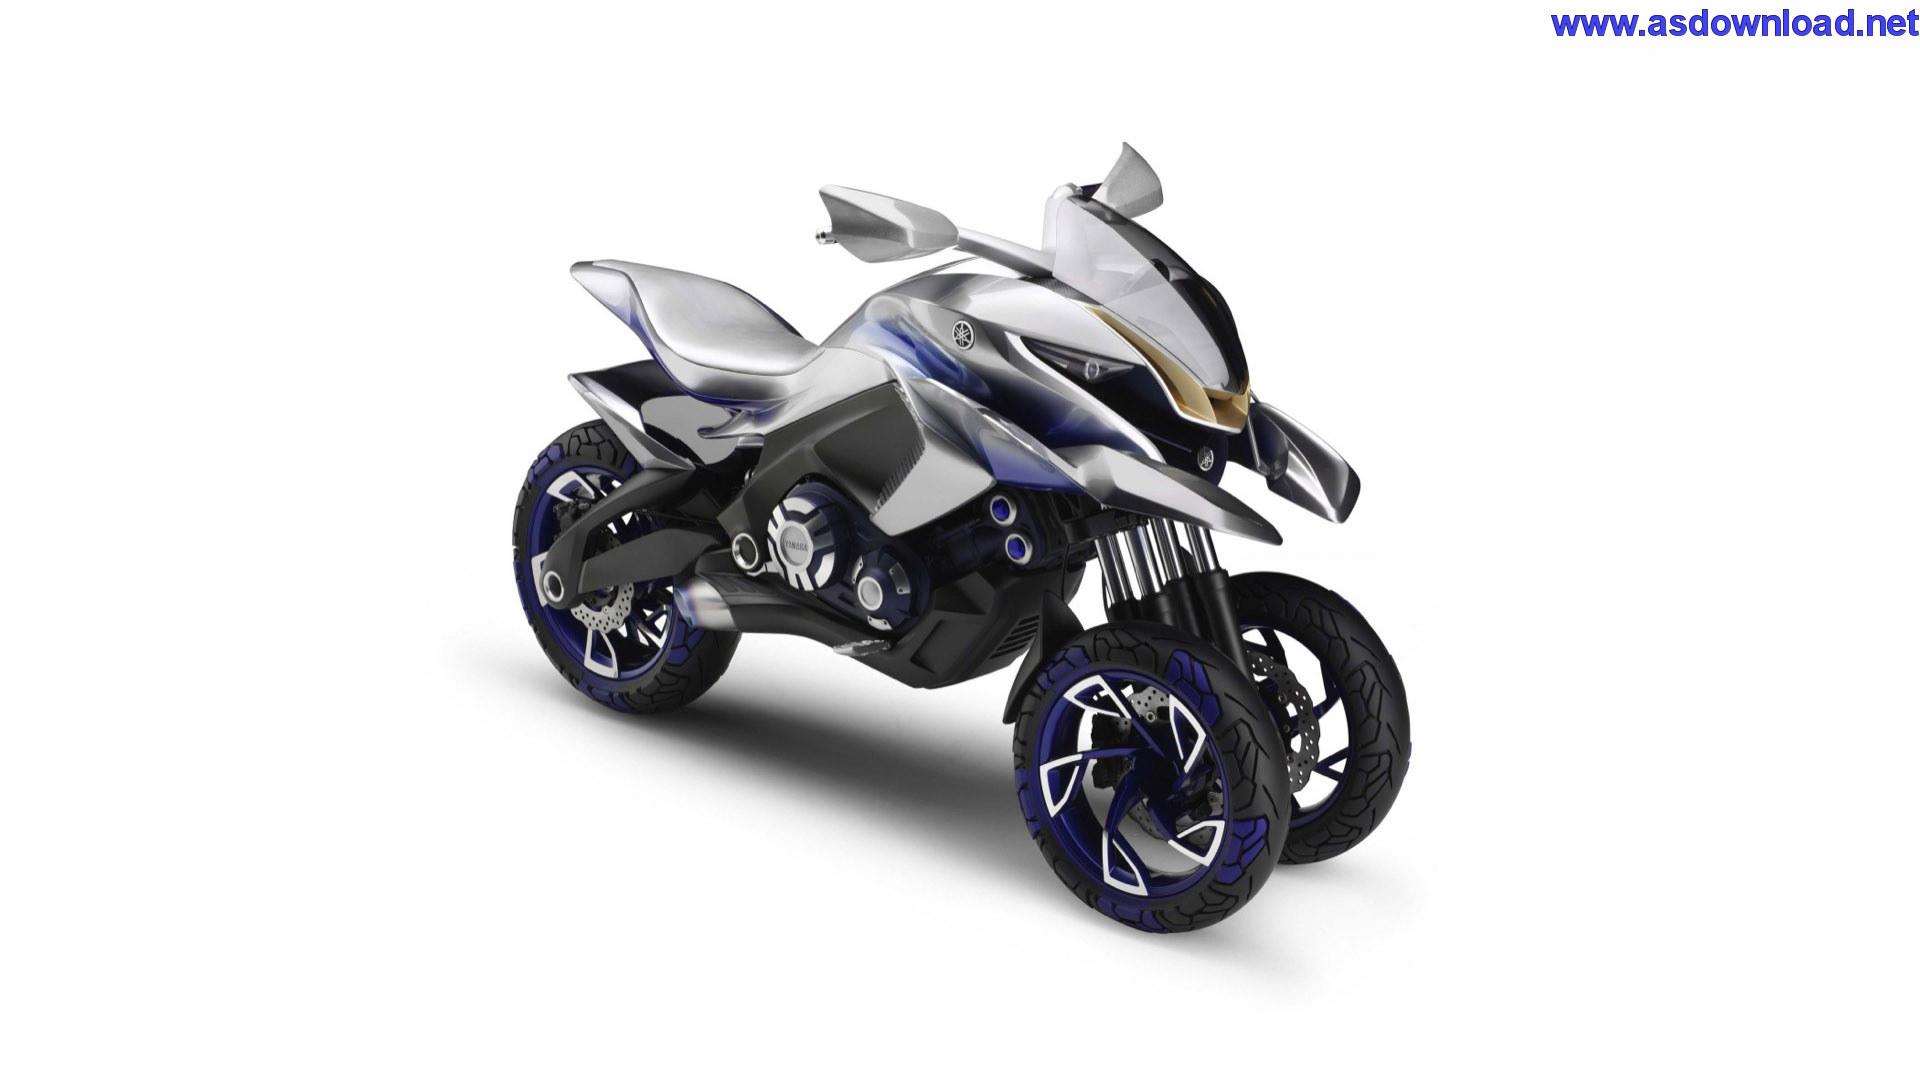 Yamaha 01GEN Concept Wallpaper دانلود عکس گرانترین, سریعترین و قوی ترین موتورسیکلت های جهان مدل 2015